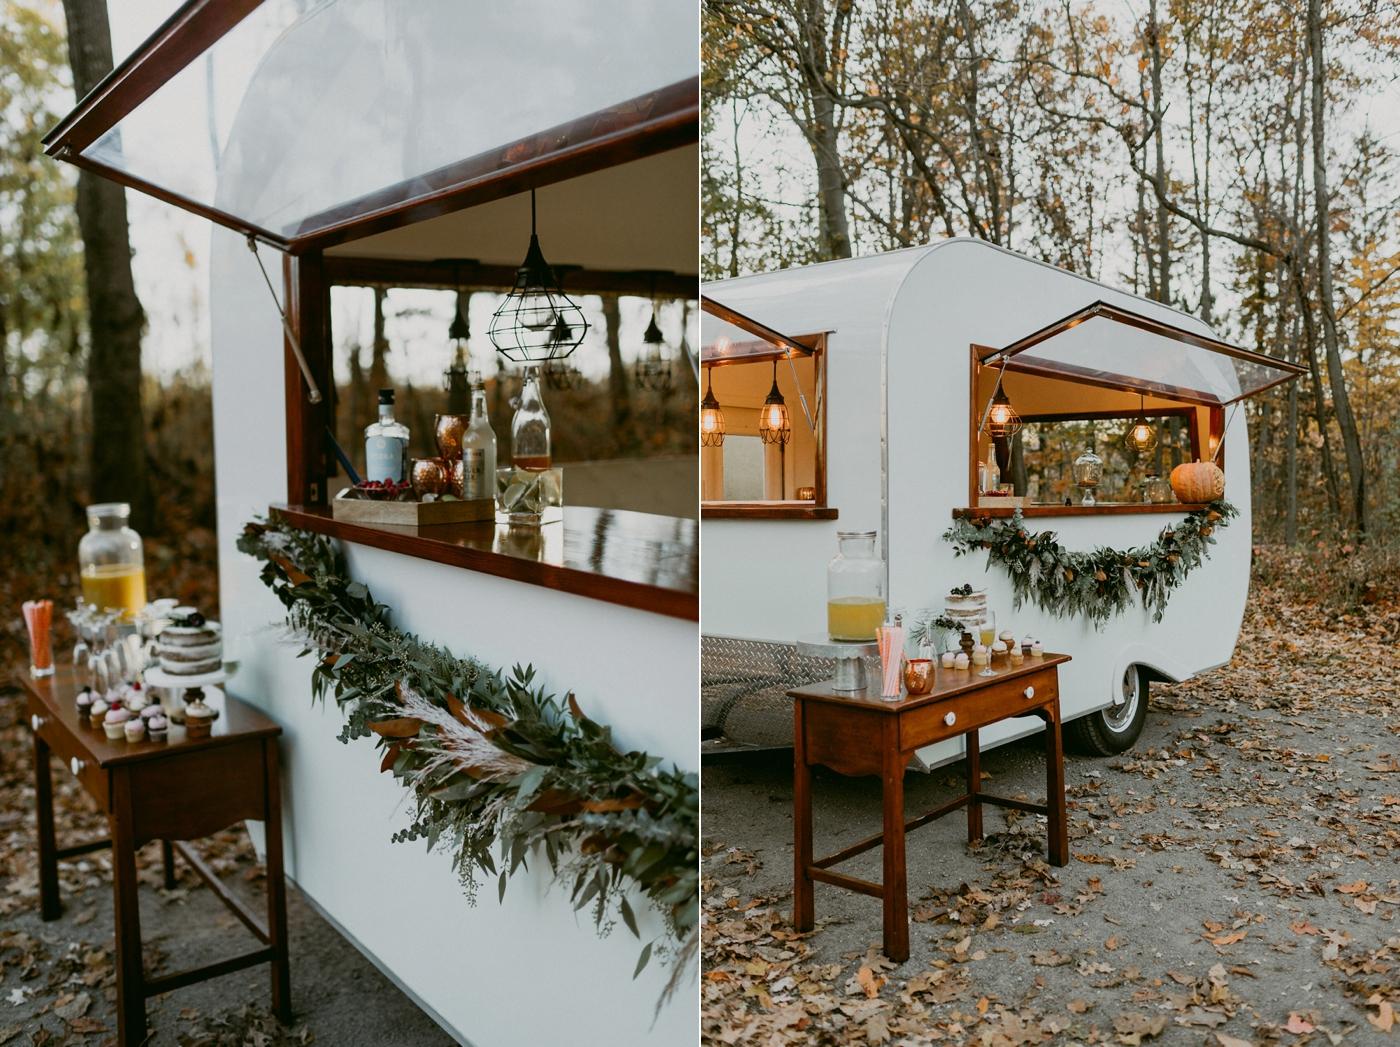 Autumn-Bridal-Shower-Vintage-Caravan-Styled-Shoot_MJPHOTO-50.jpg